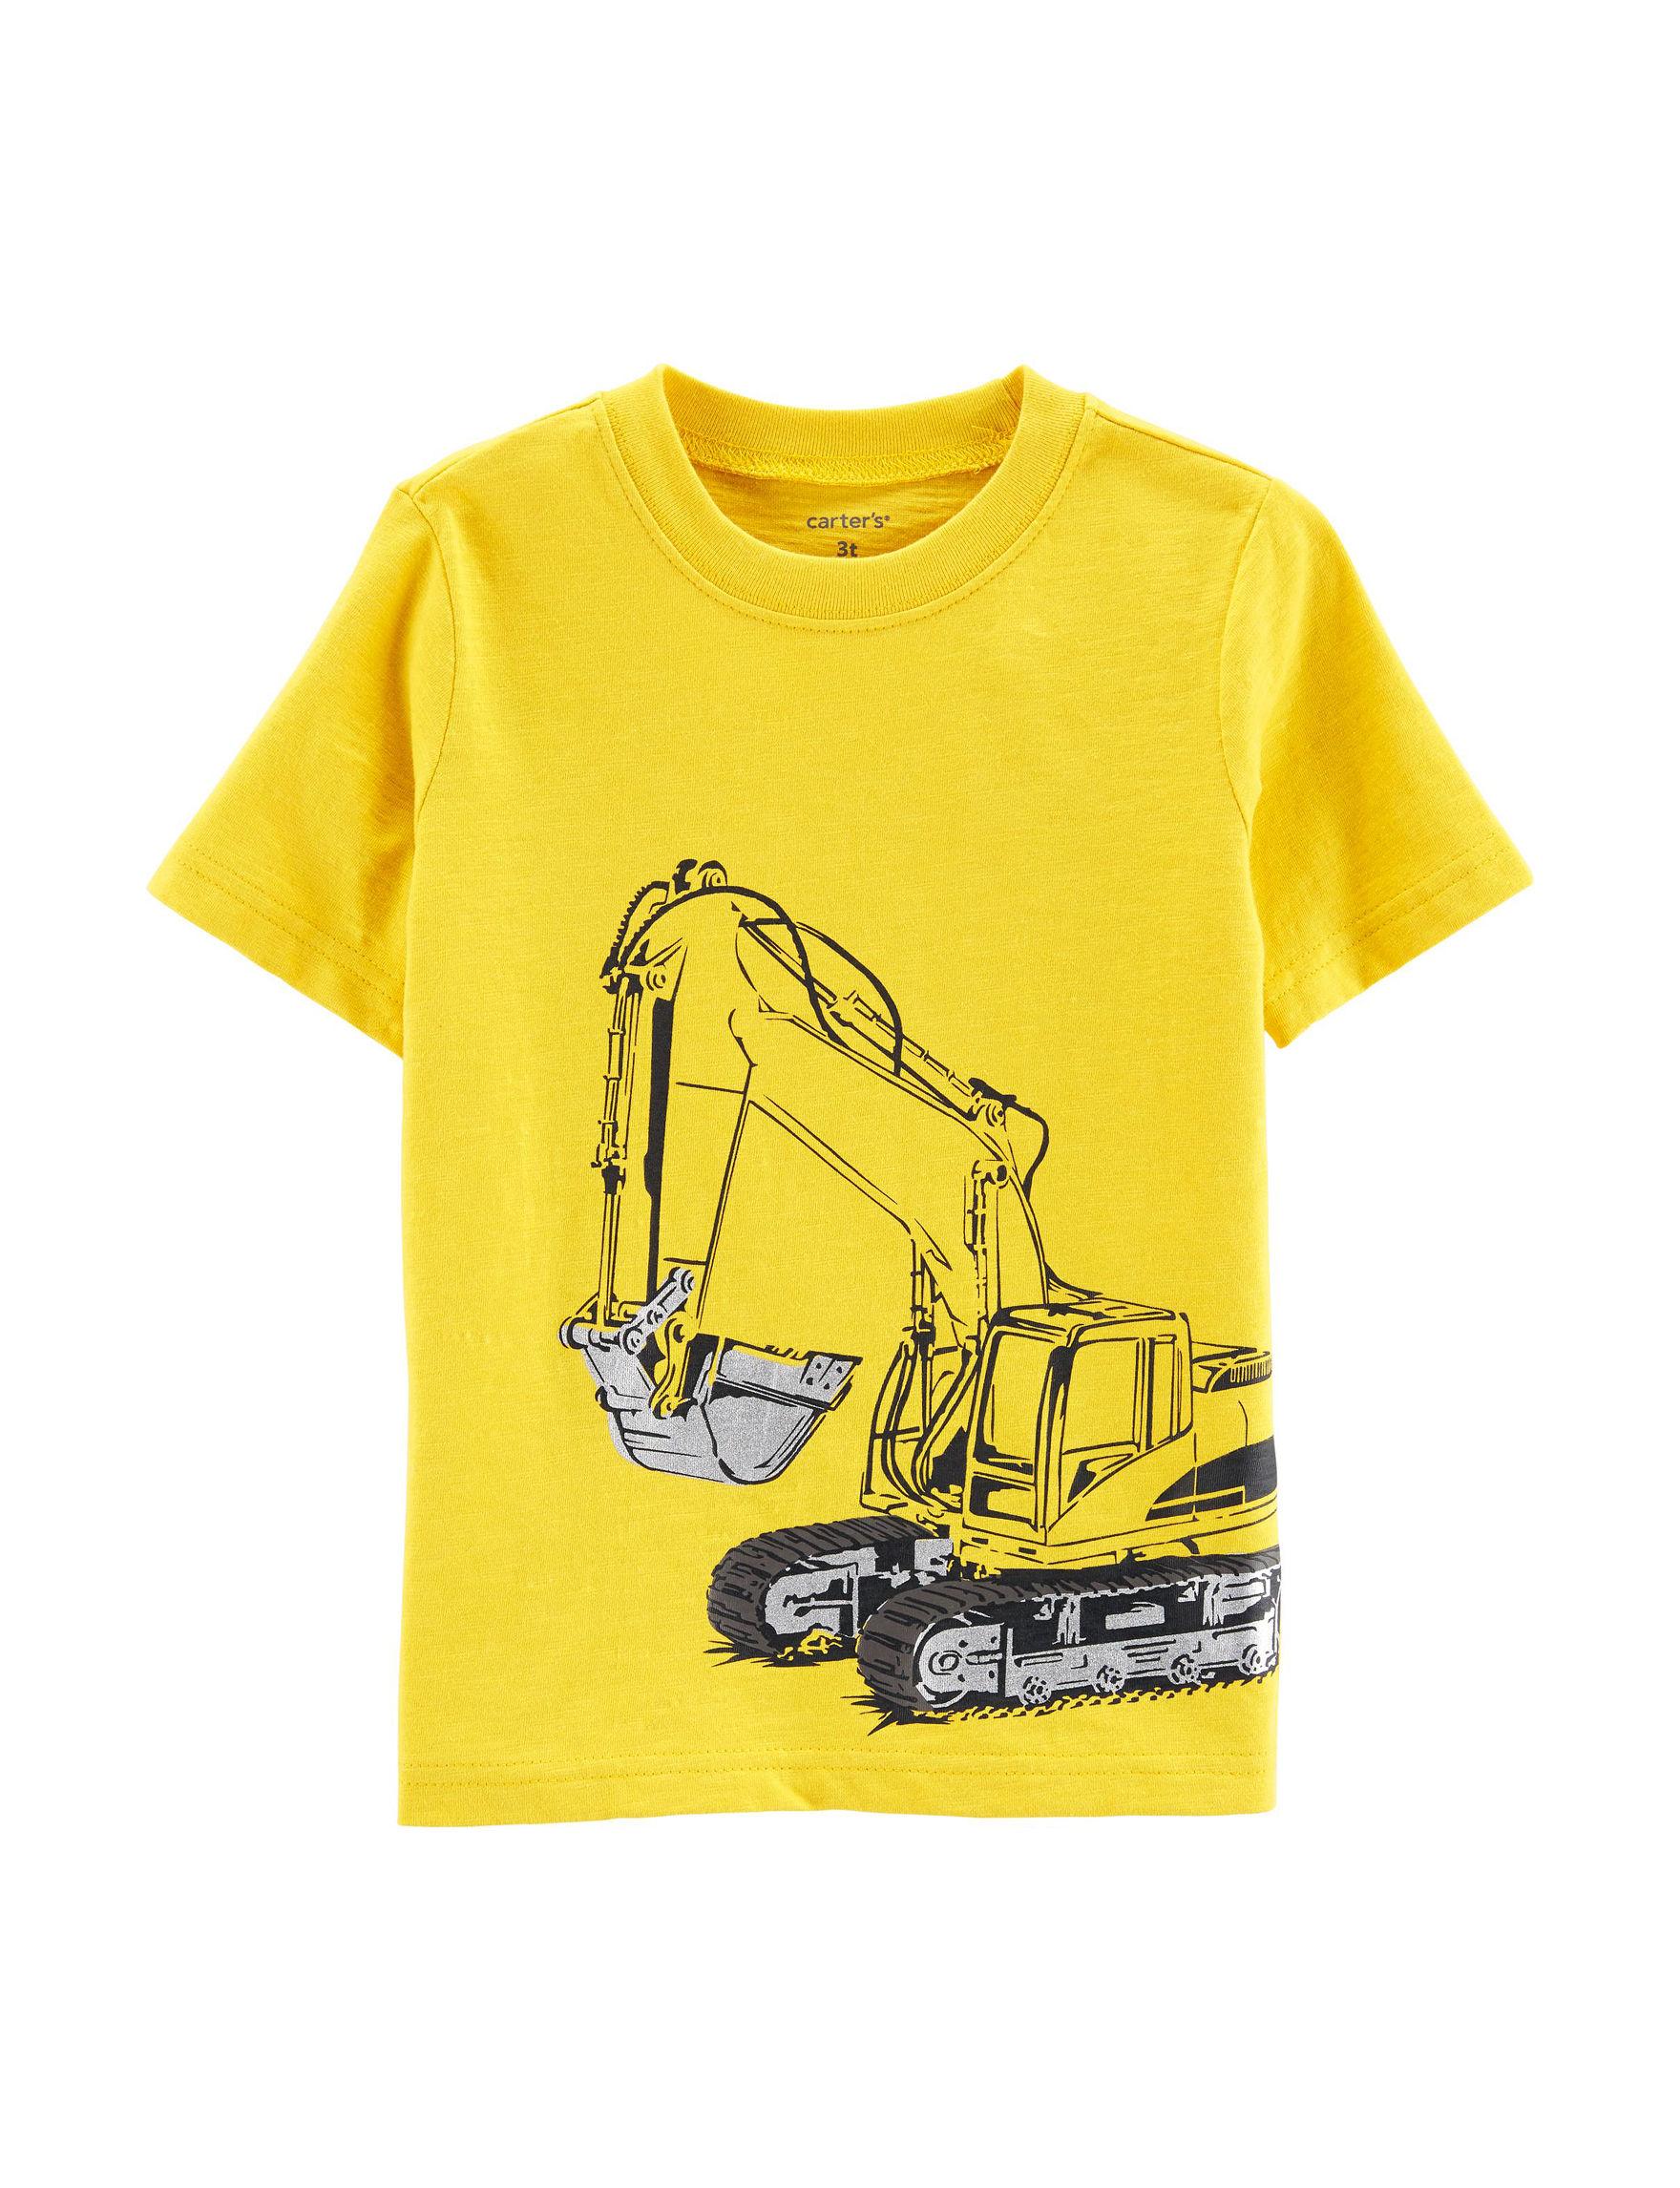 Carter's Yellow Tees & Tanks